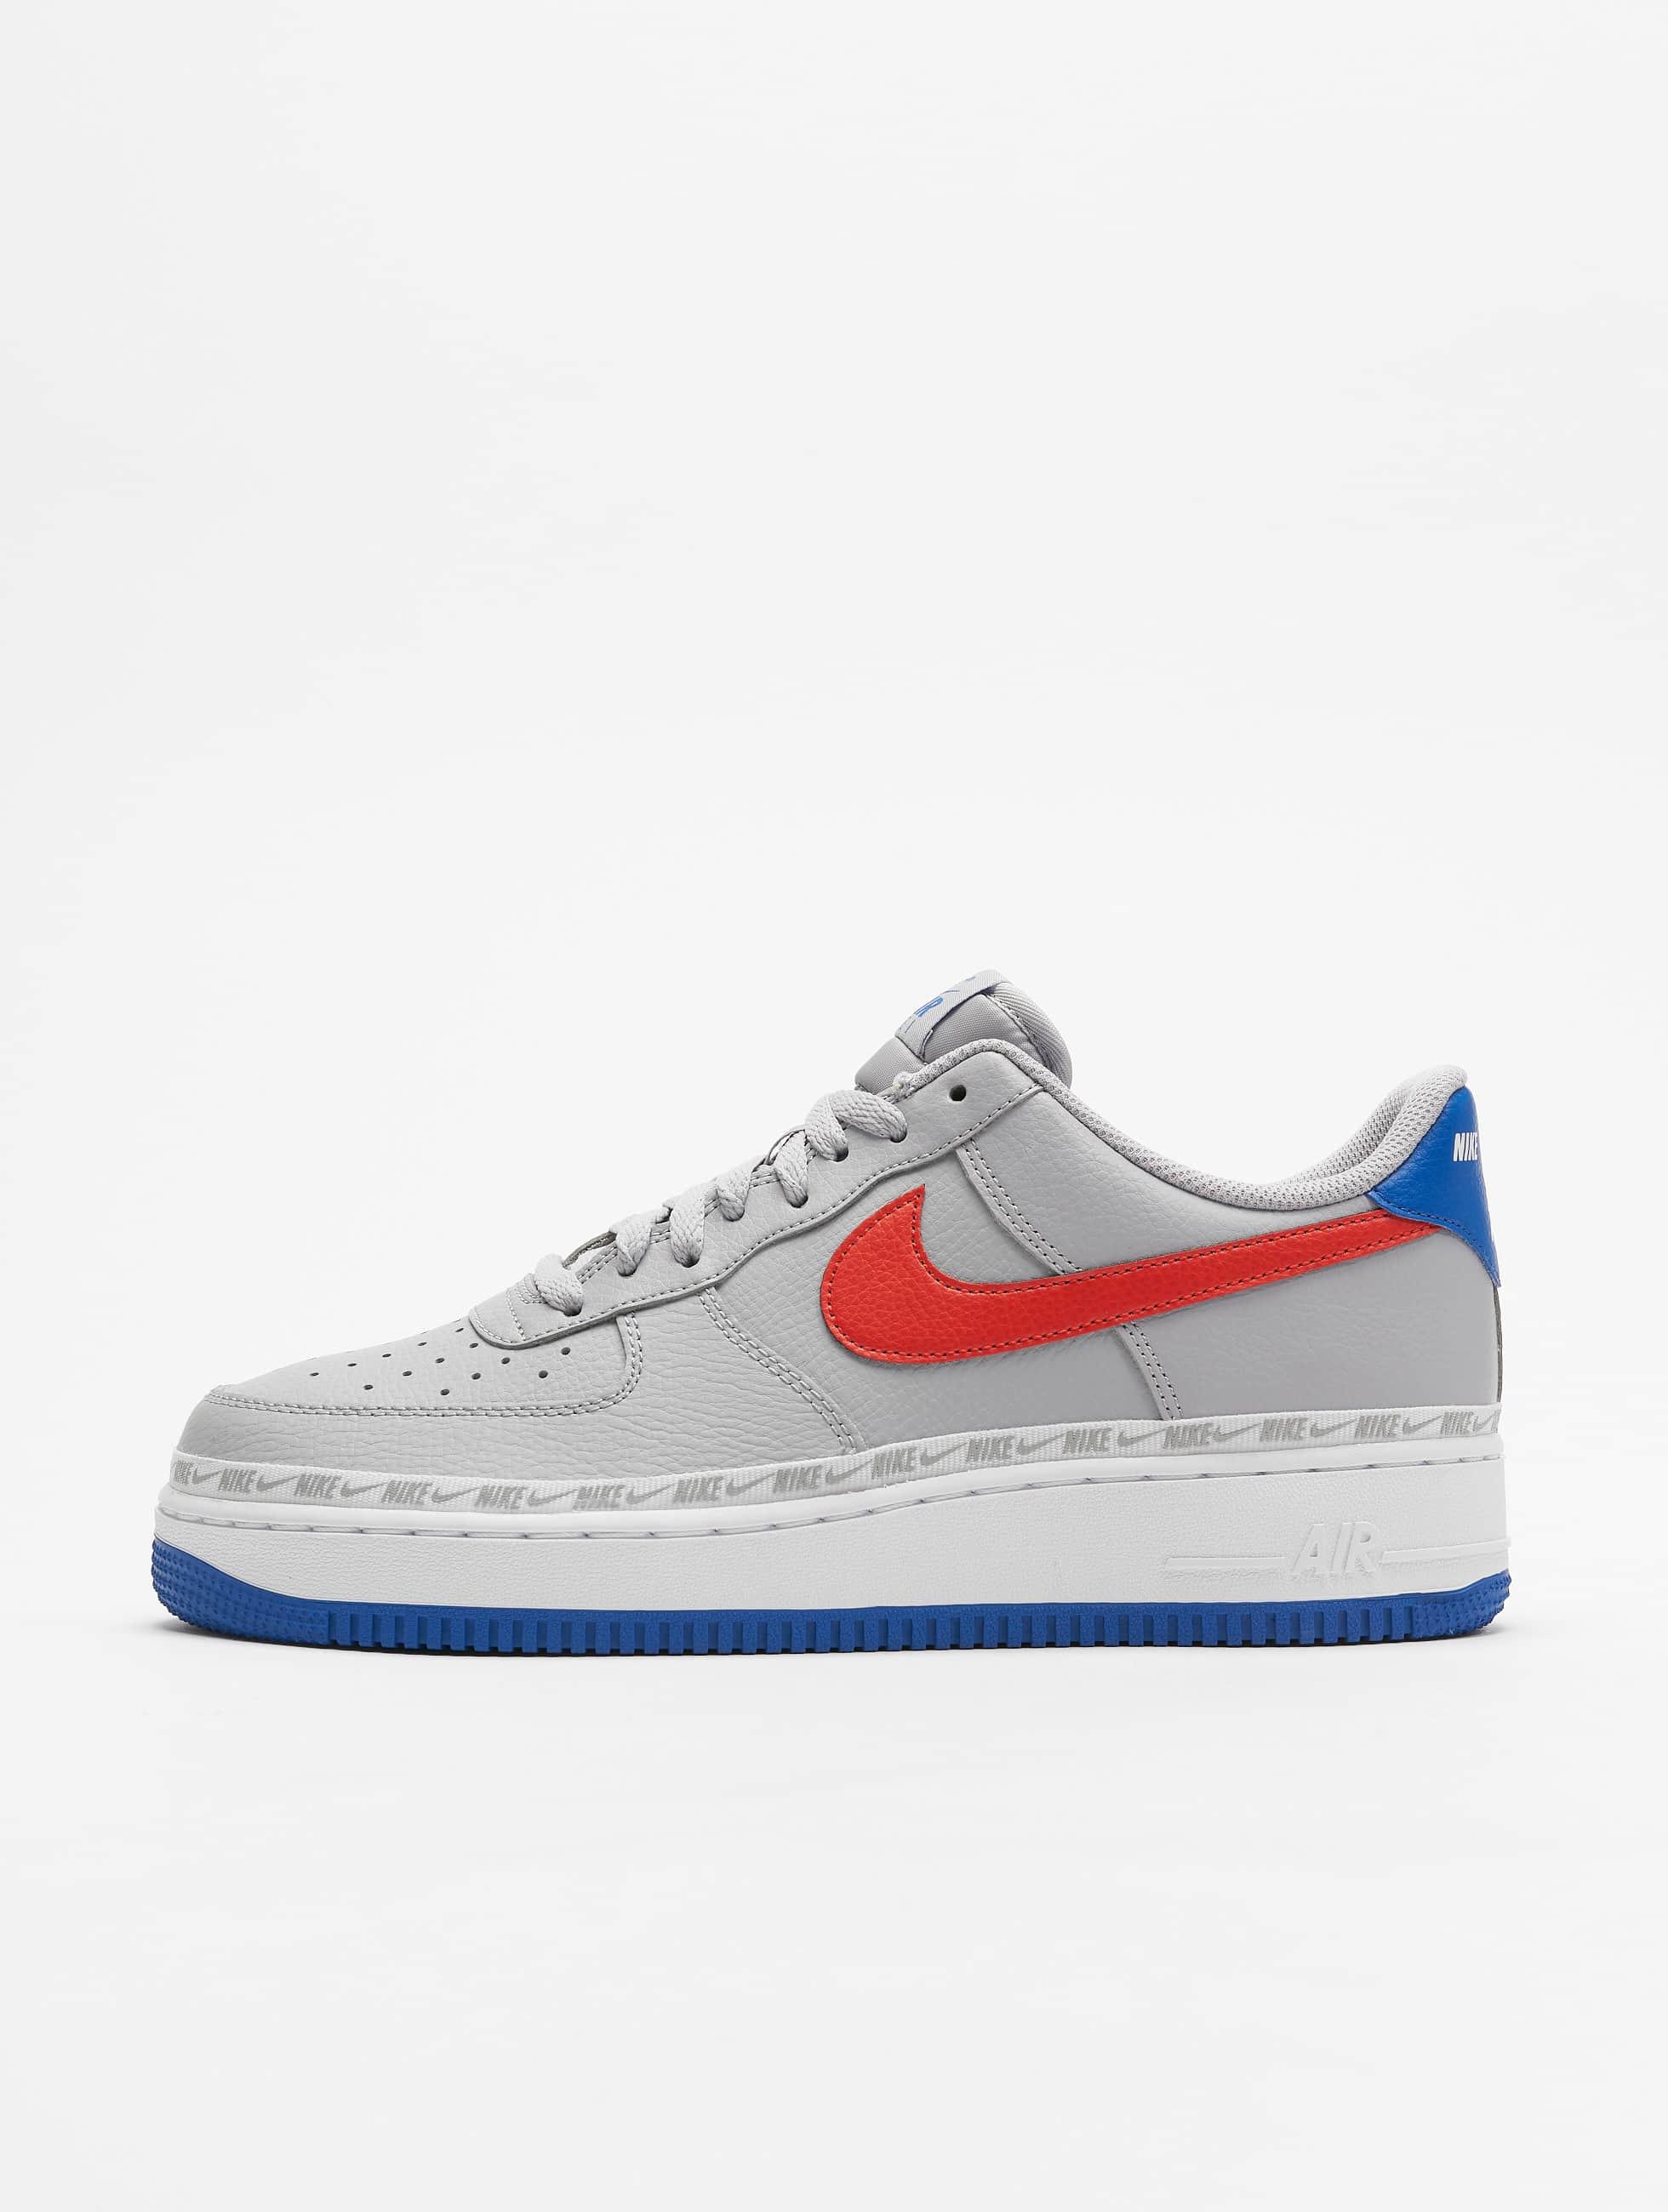 8bec2b2bdcb Nike schoen / sneaker Air Force 1 `07 LV8 in grijs 589905